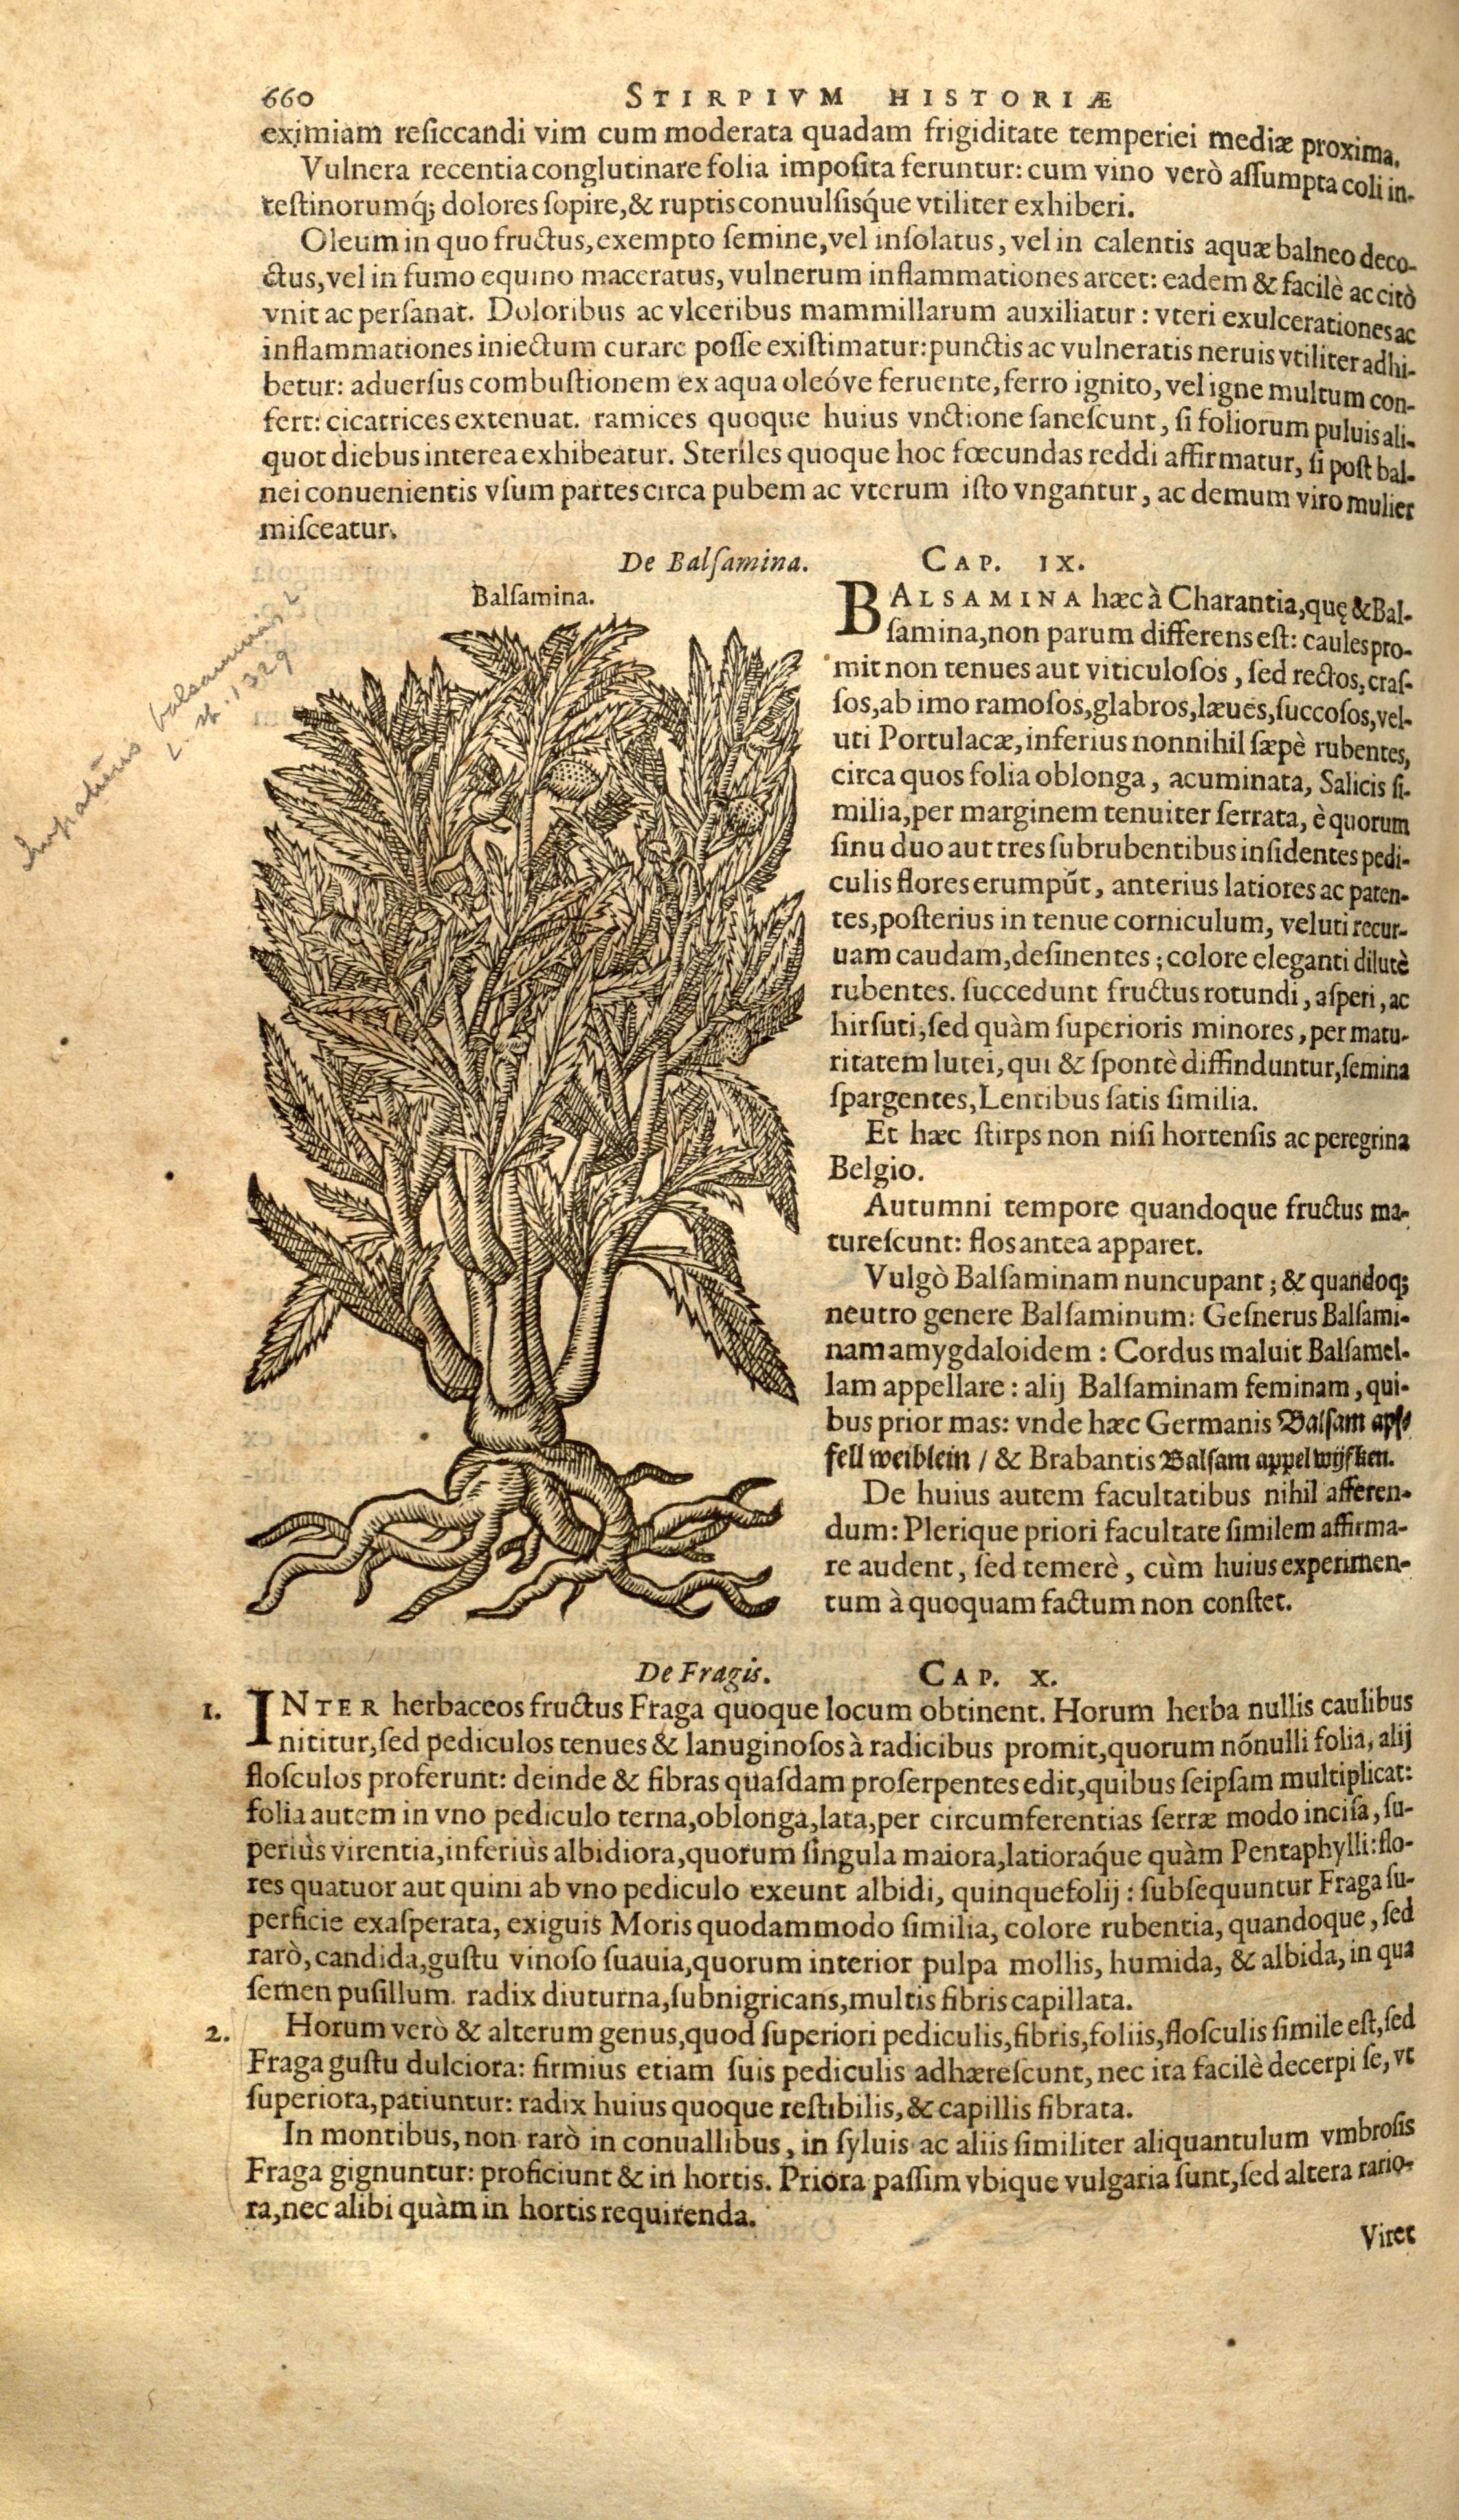 historiae pemptades sex, sive libri XXX (Page 660) BHL8100316.jpg Remberti Dodonaei ... Stirpium historiae pemptades sex, sive libri XXX. Date 1583 Source